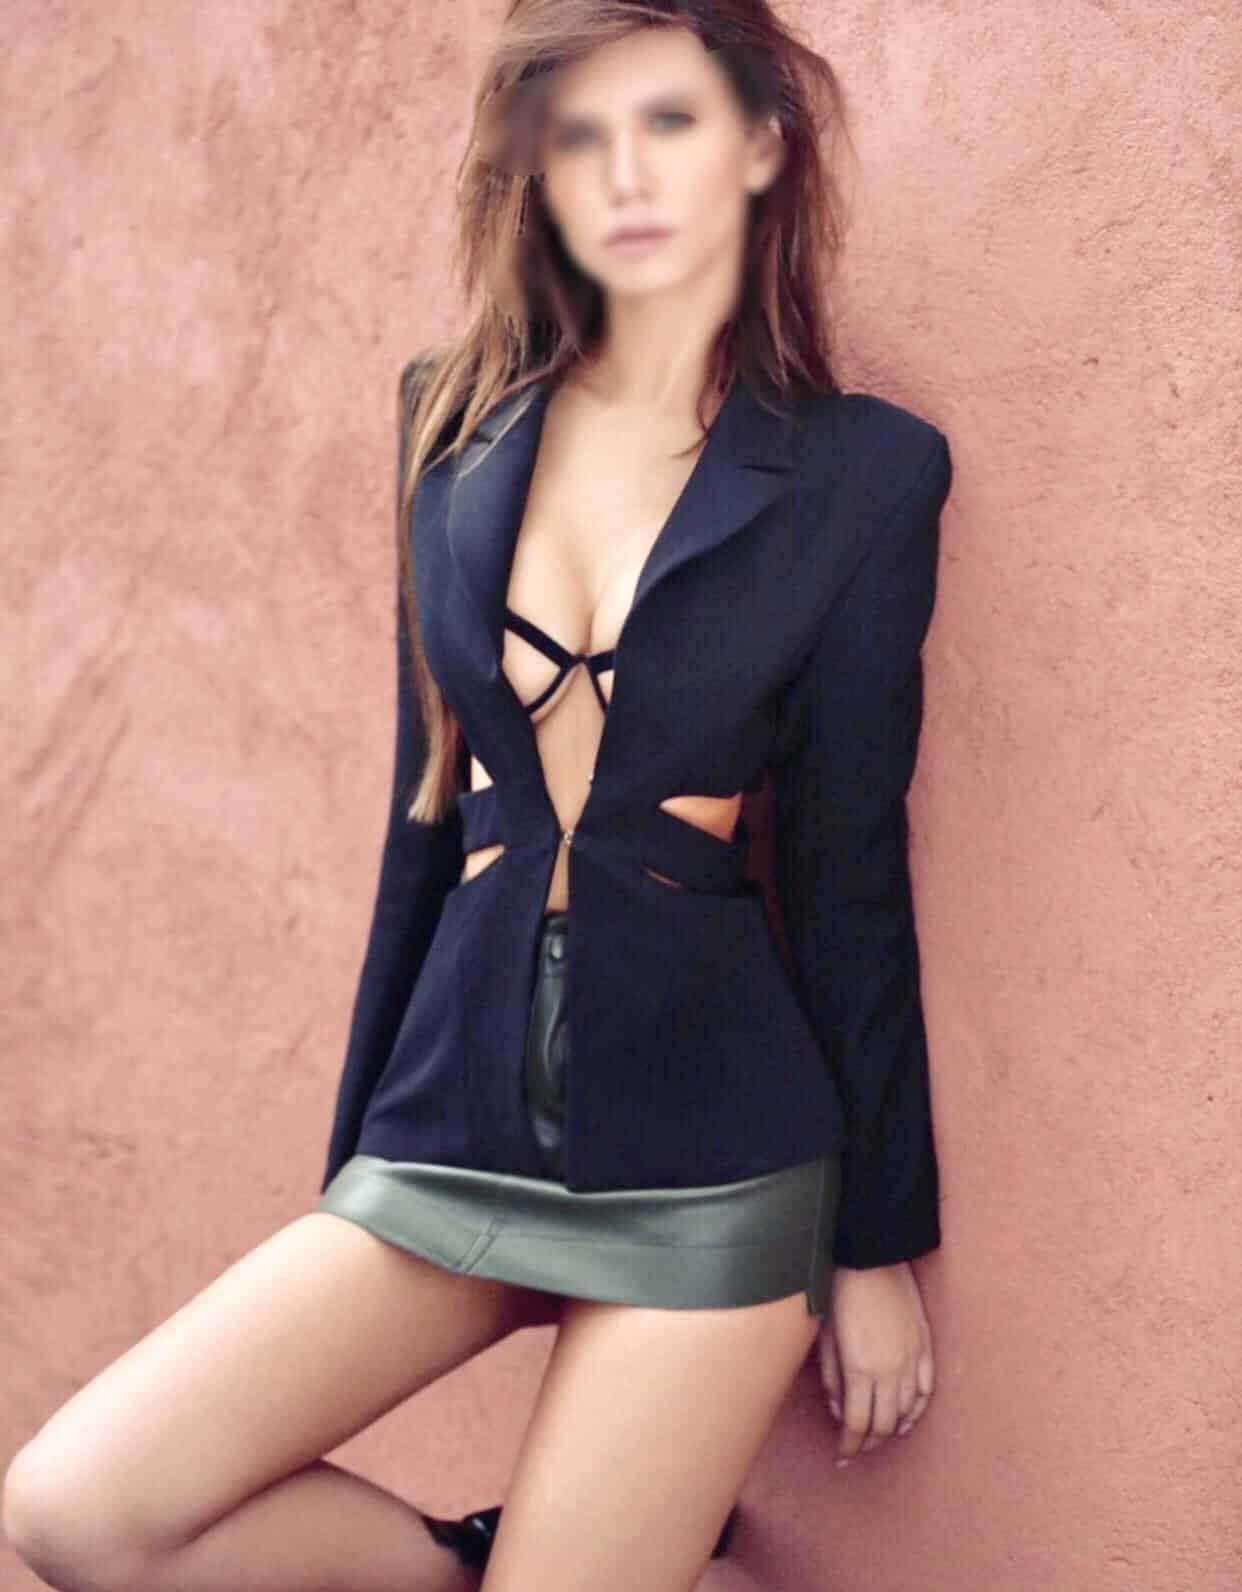 Sara from Agence Rose